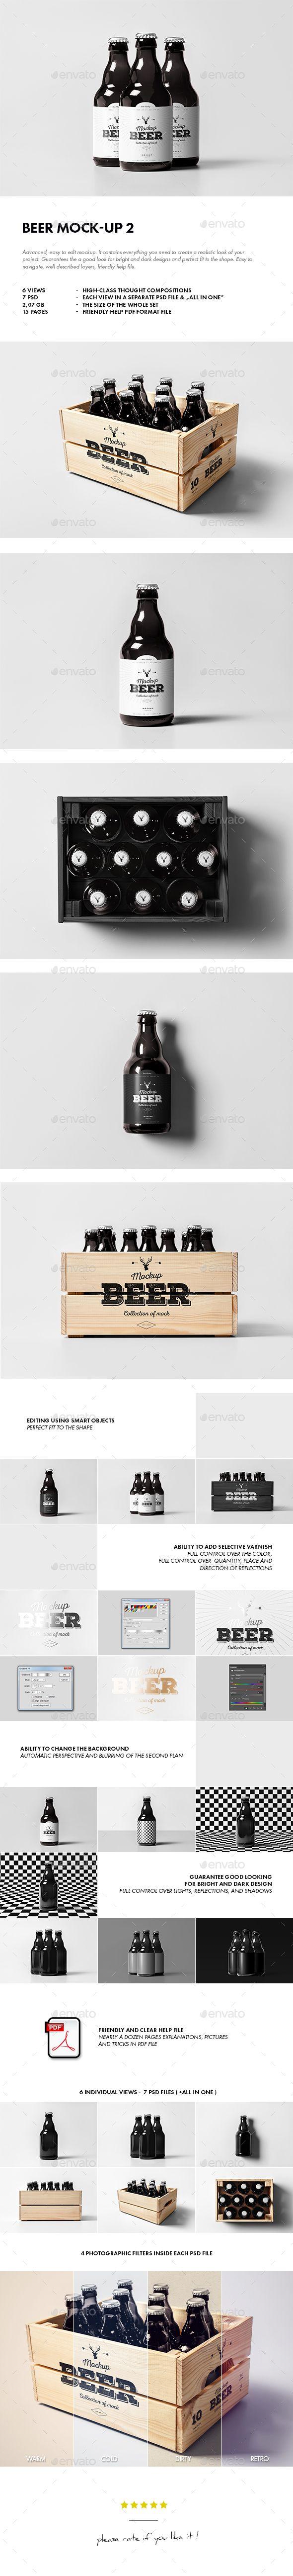 Beer Mock-up. Download here: http://graphicriver.net/item/beer-mockup-2/15390920?ref=ksioks